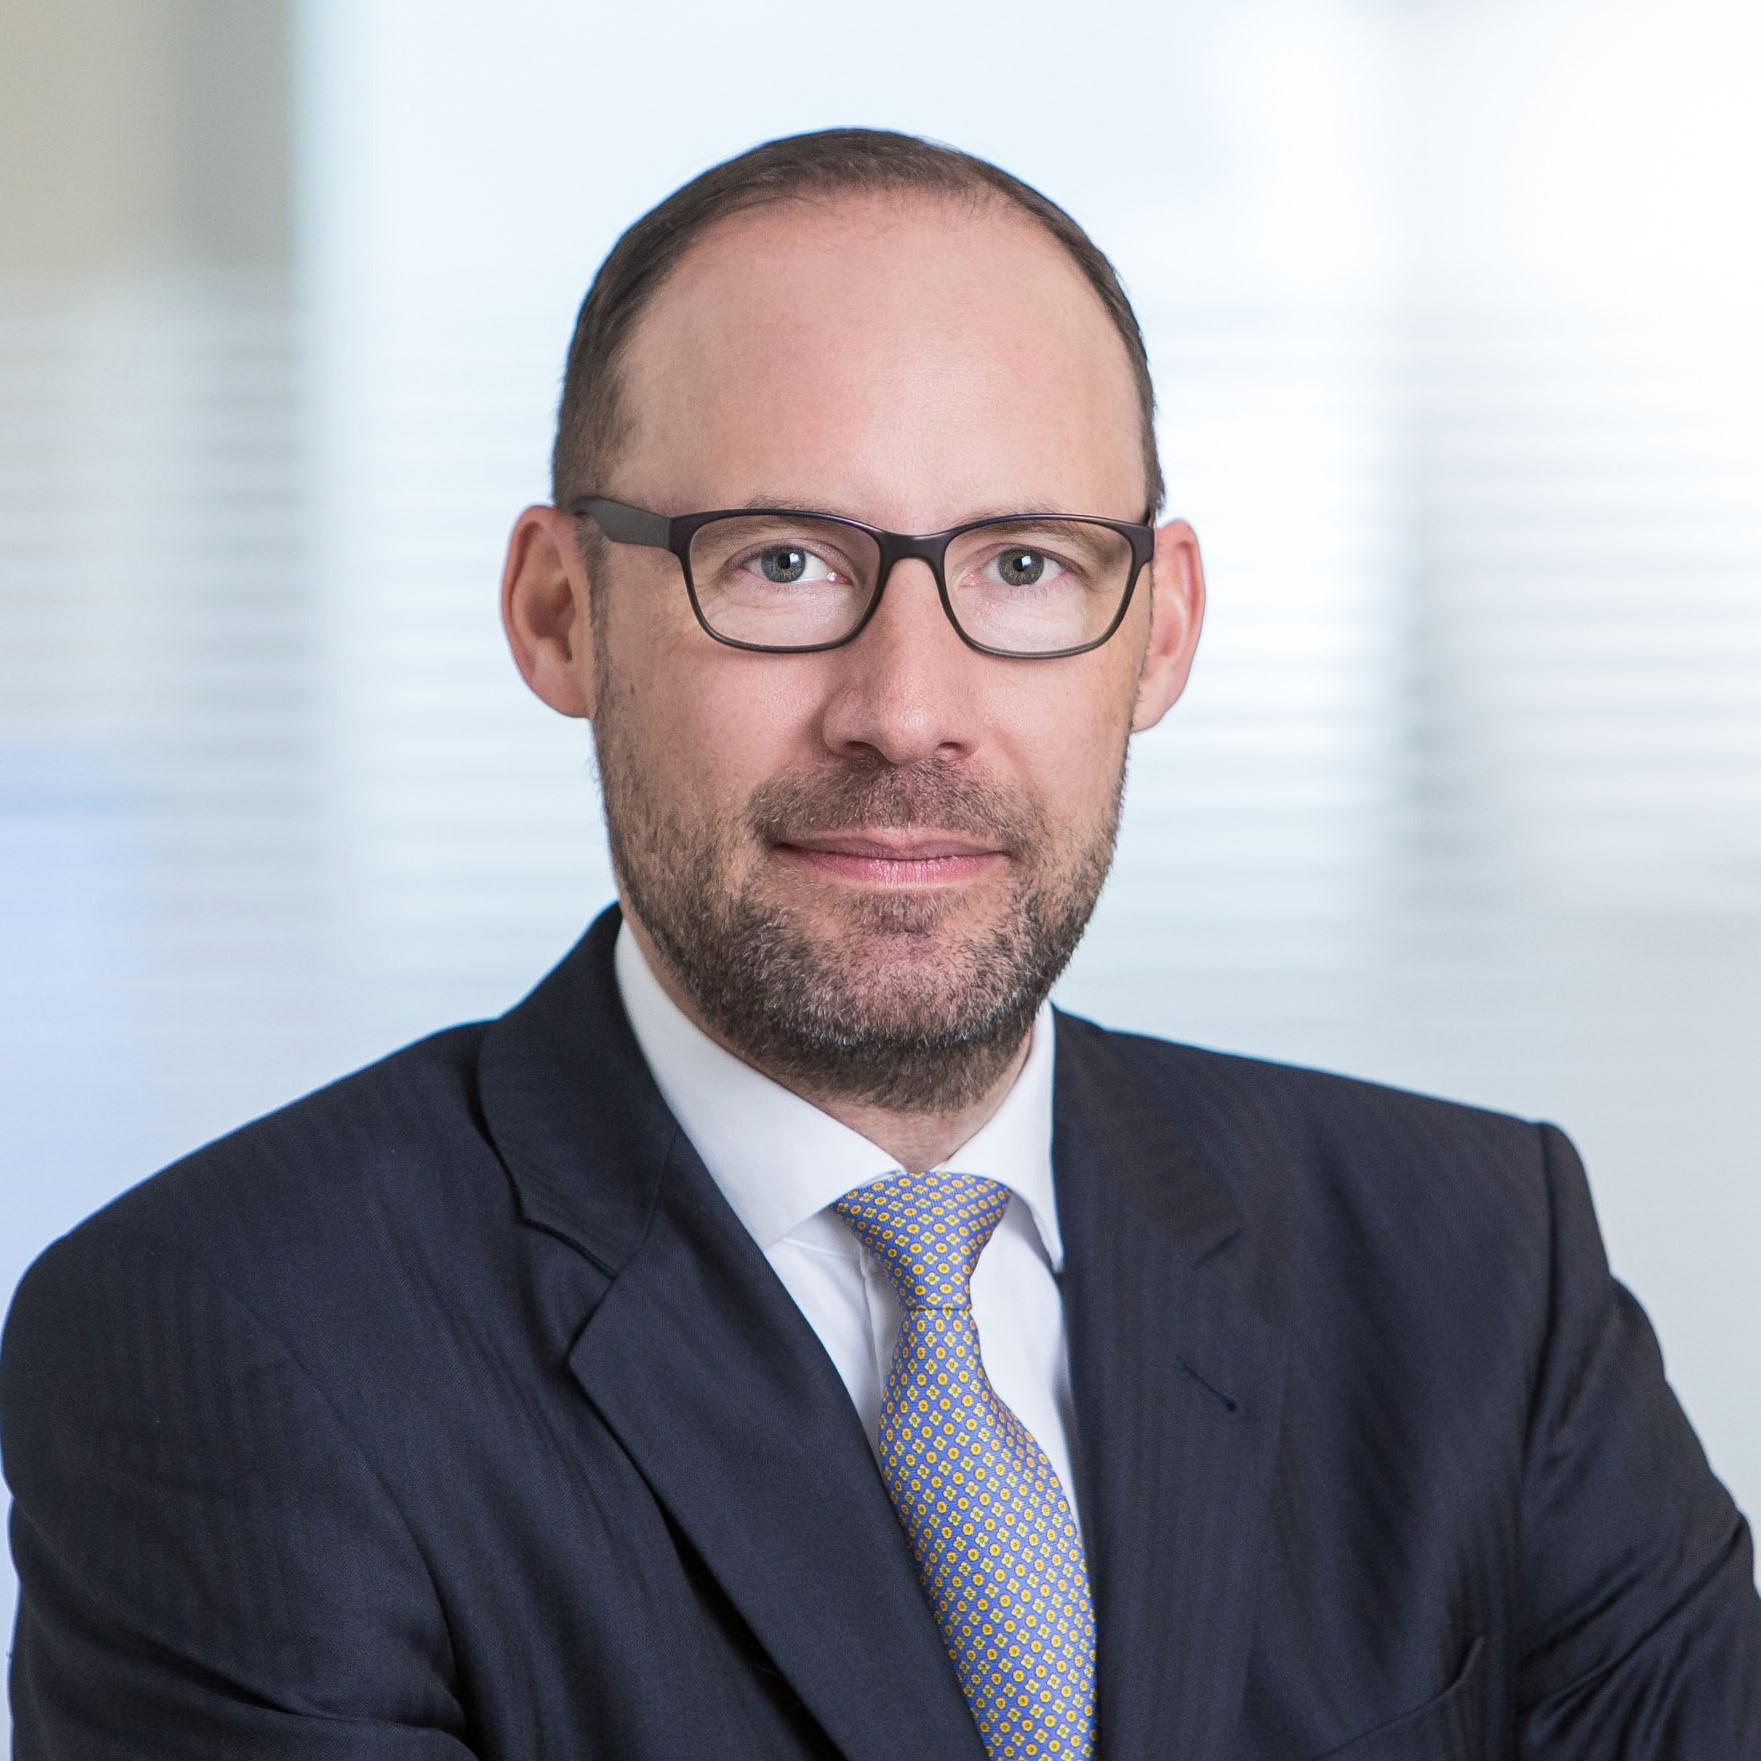 Dr. Stefan Mai